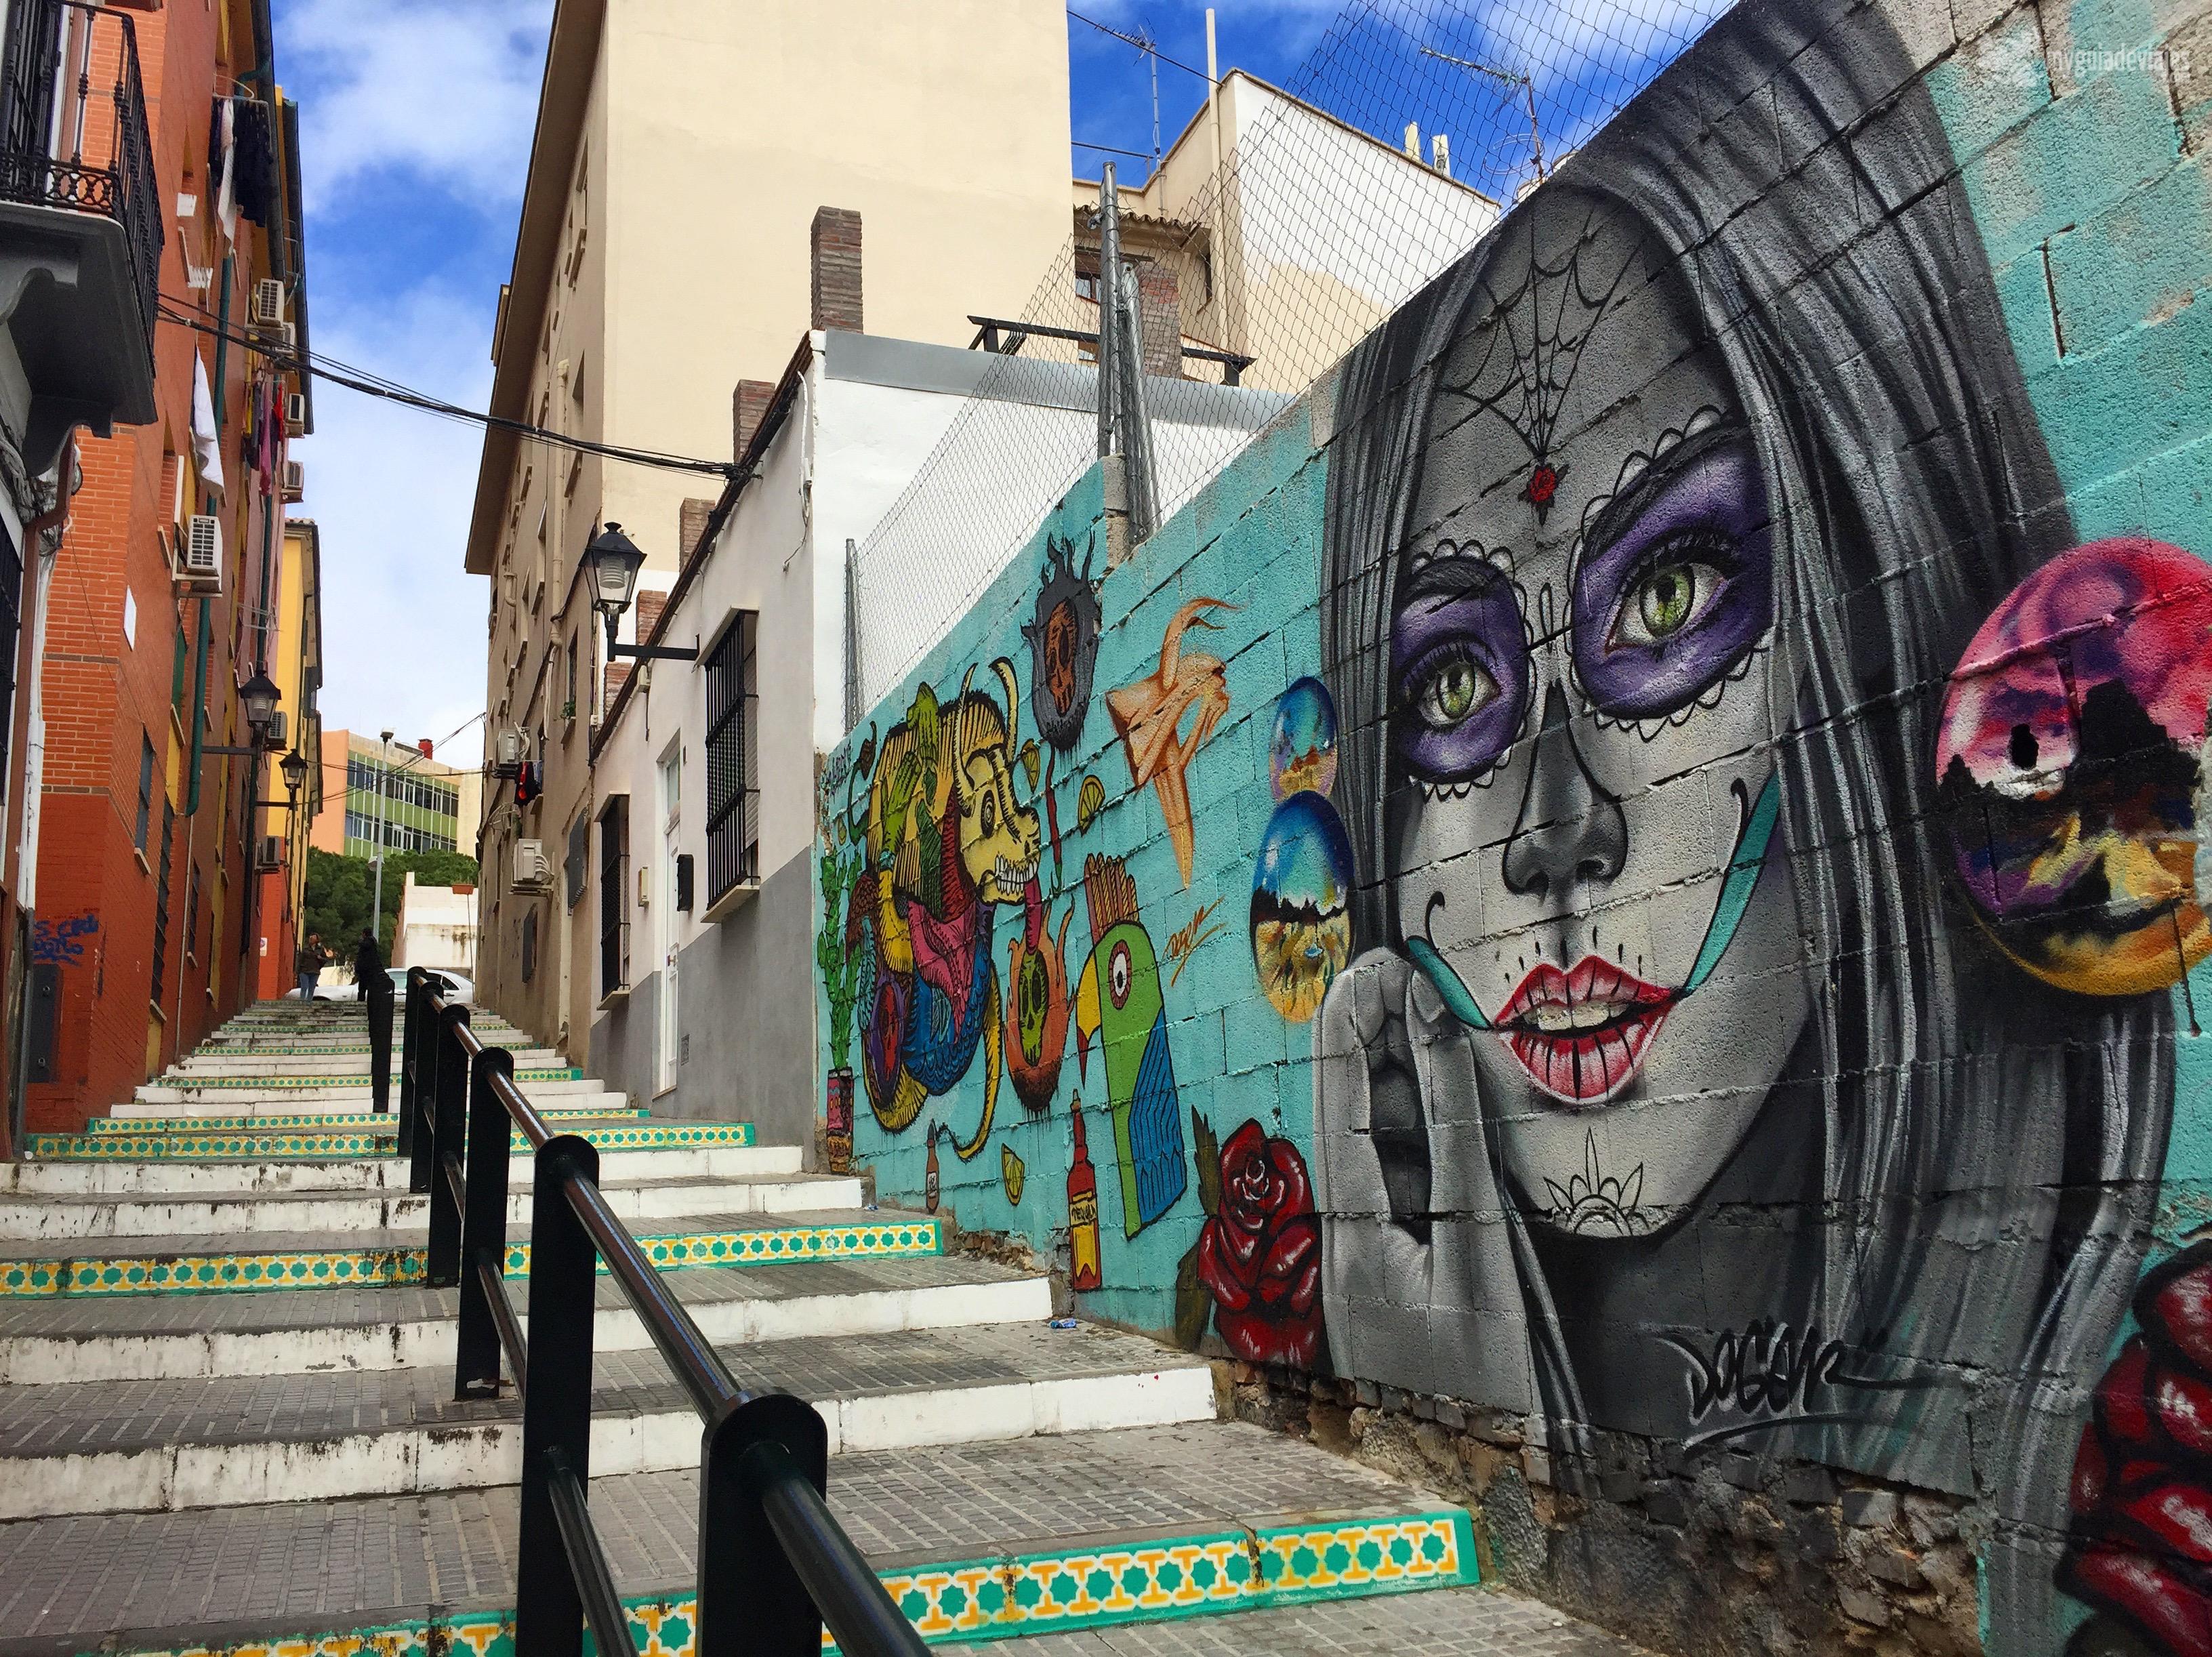 Resultado de imagen de street art soho malaga